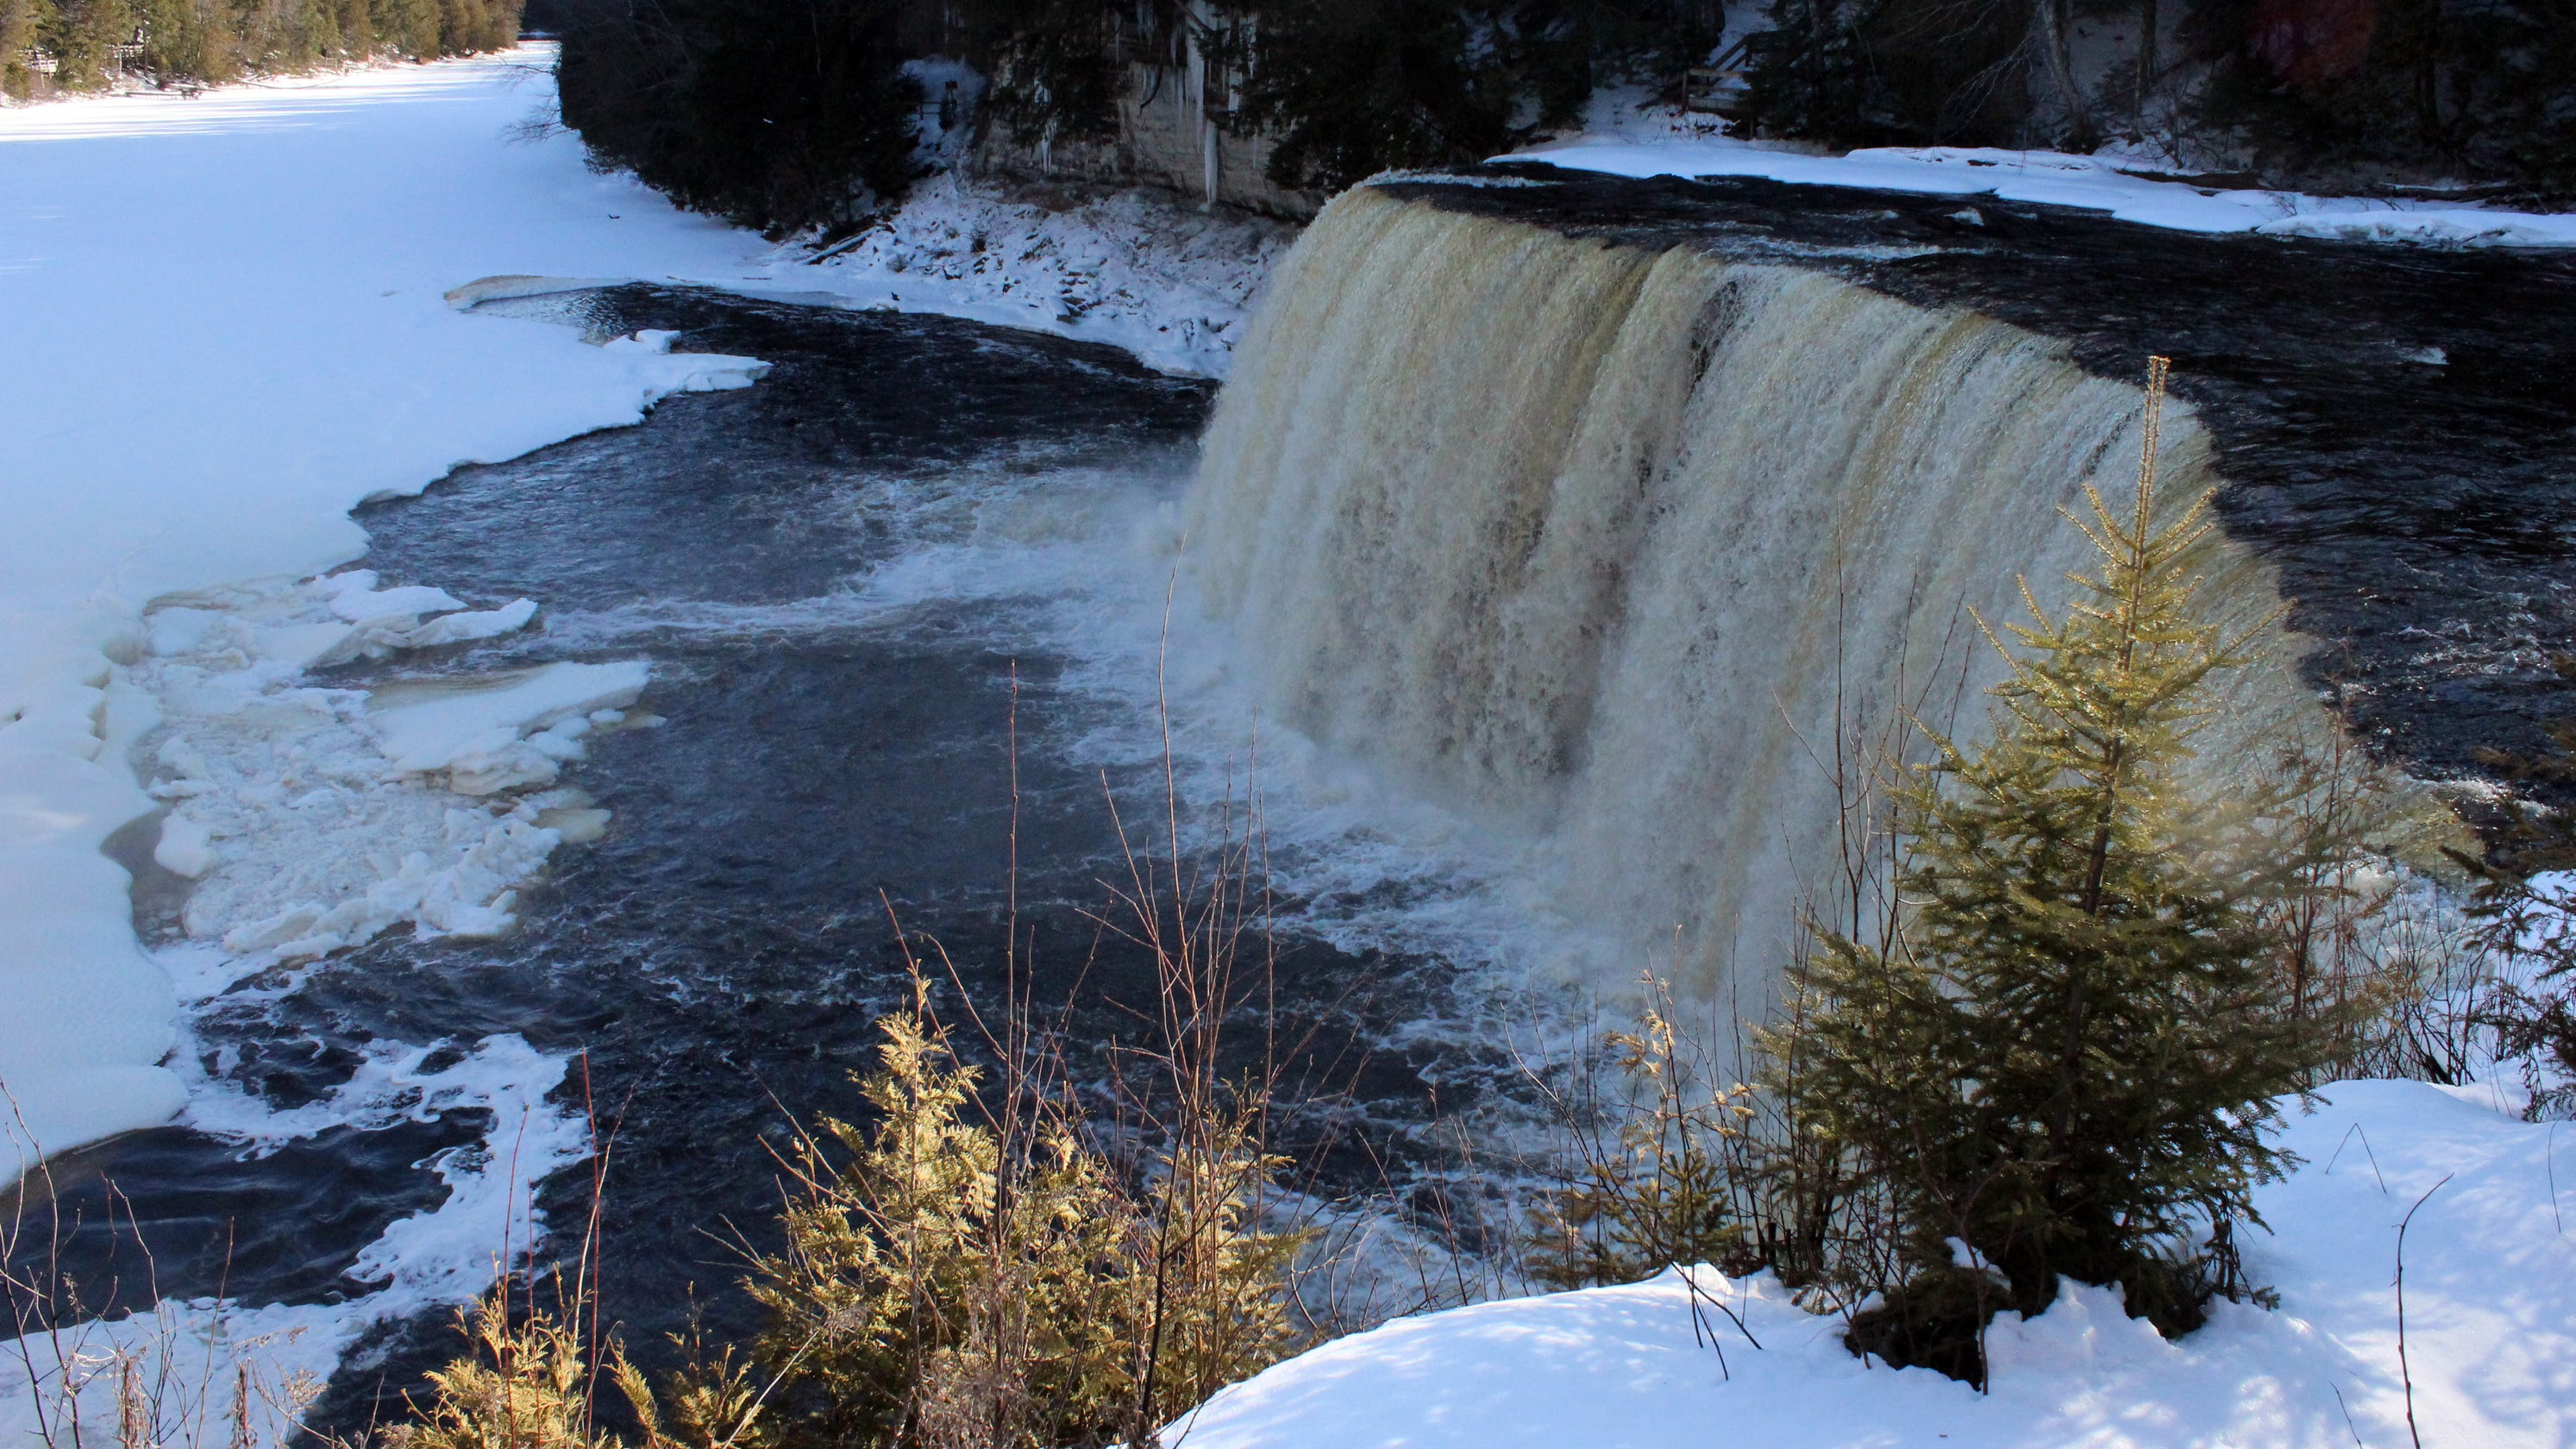 Watch: Kayaker paddles over Michigan's Tahquamenon Falls